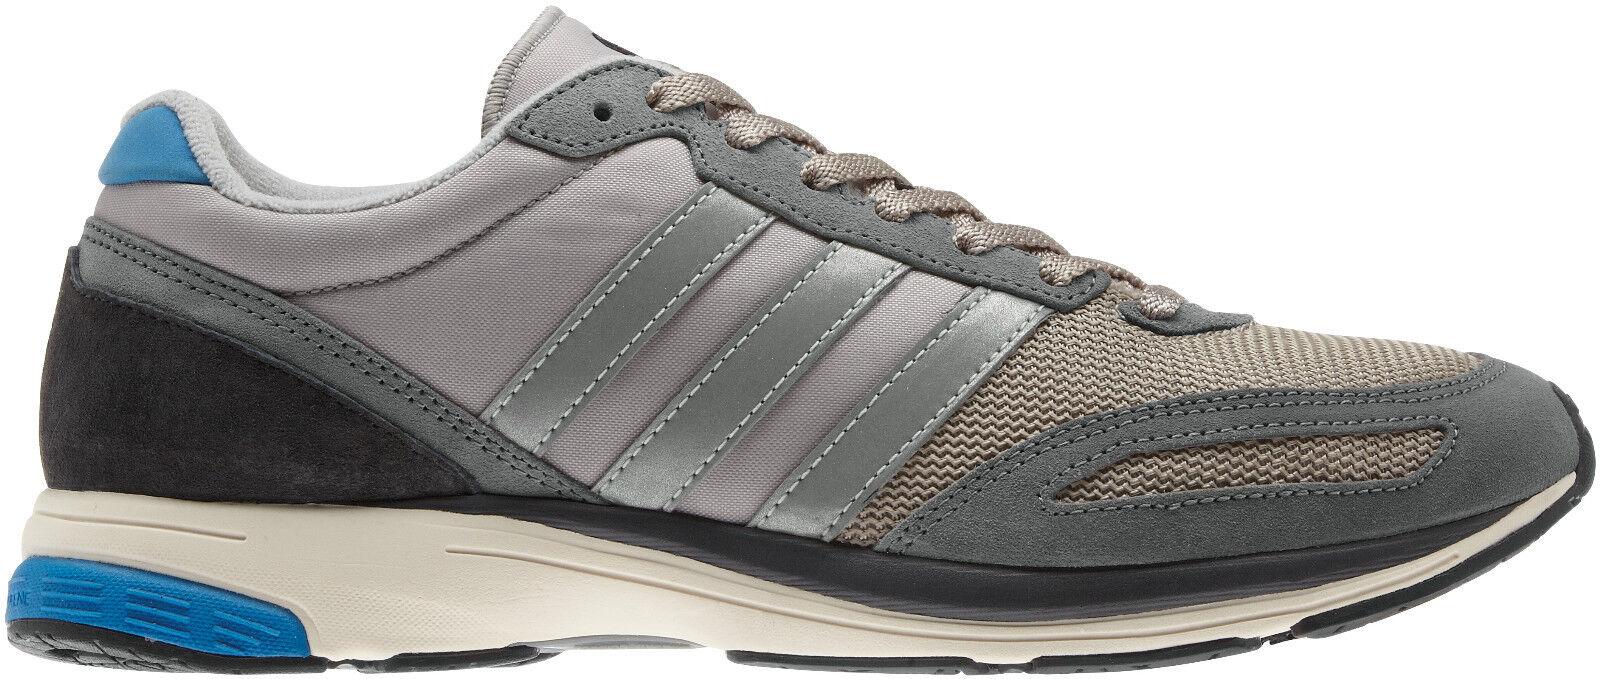 Mens New Adidas Adizero Adios 2 Trainer Sneakers Sports shoes - Grey - RRP